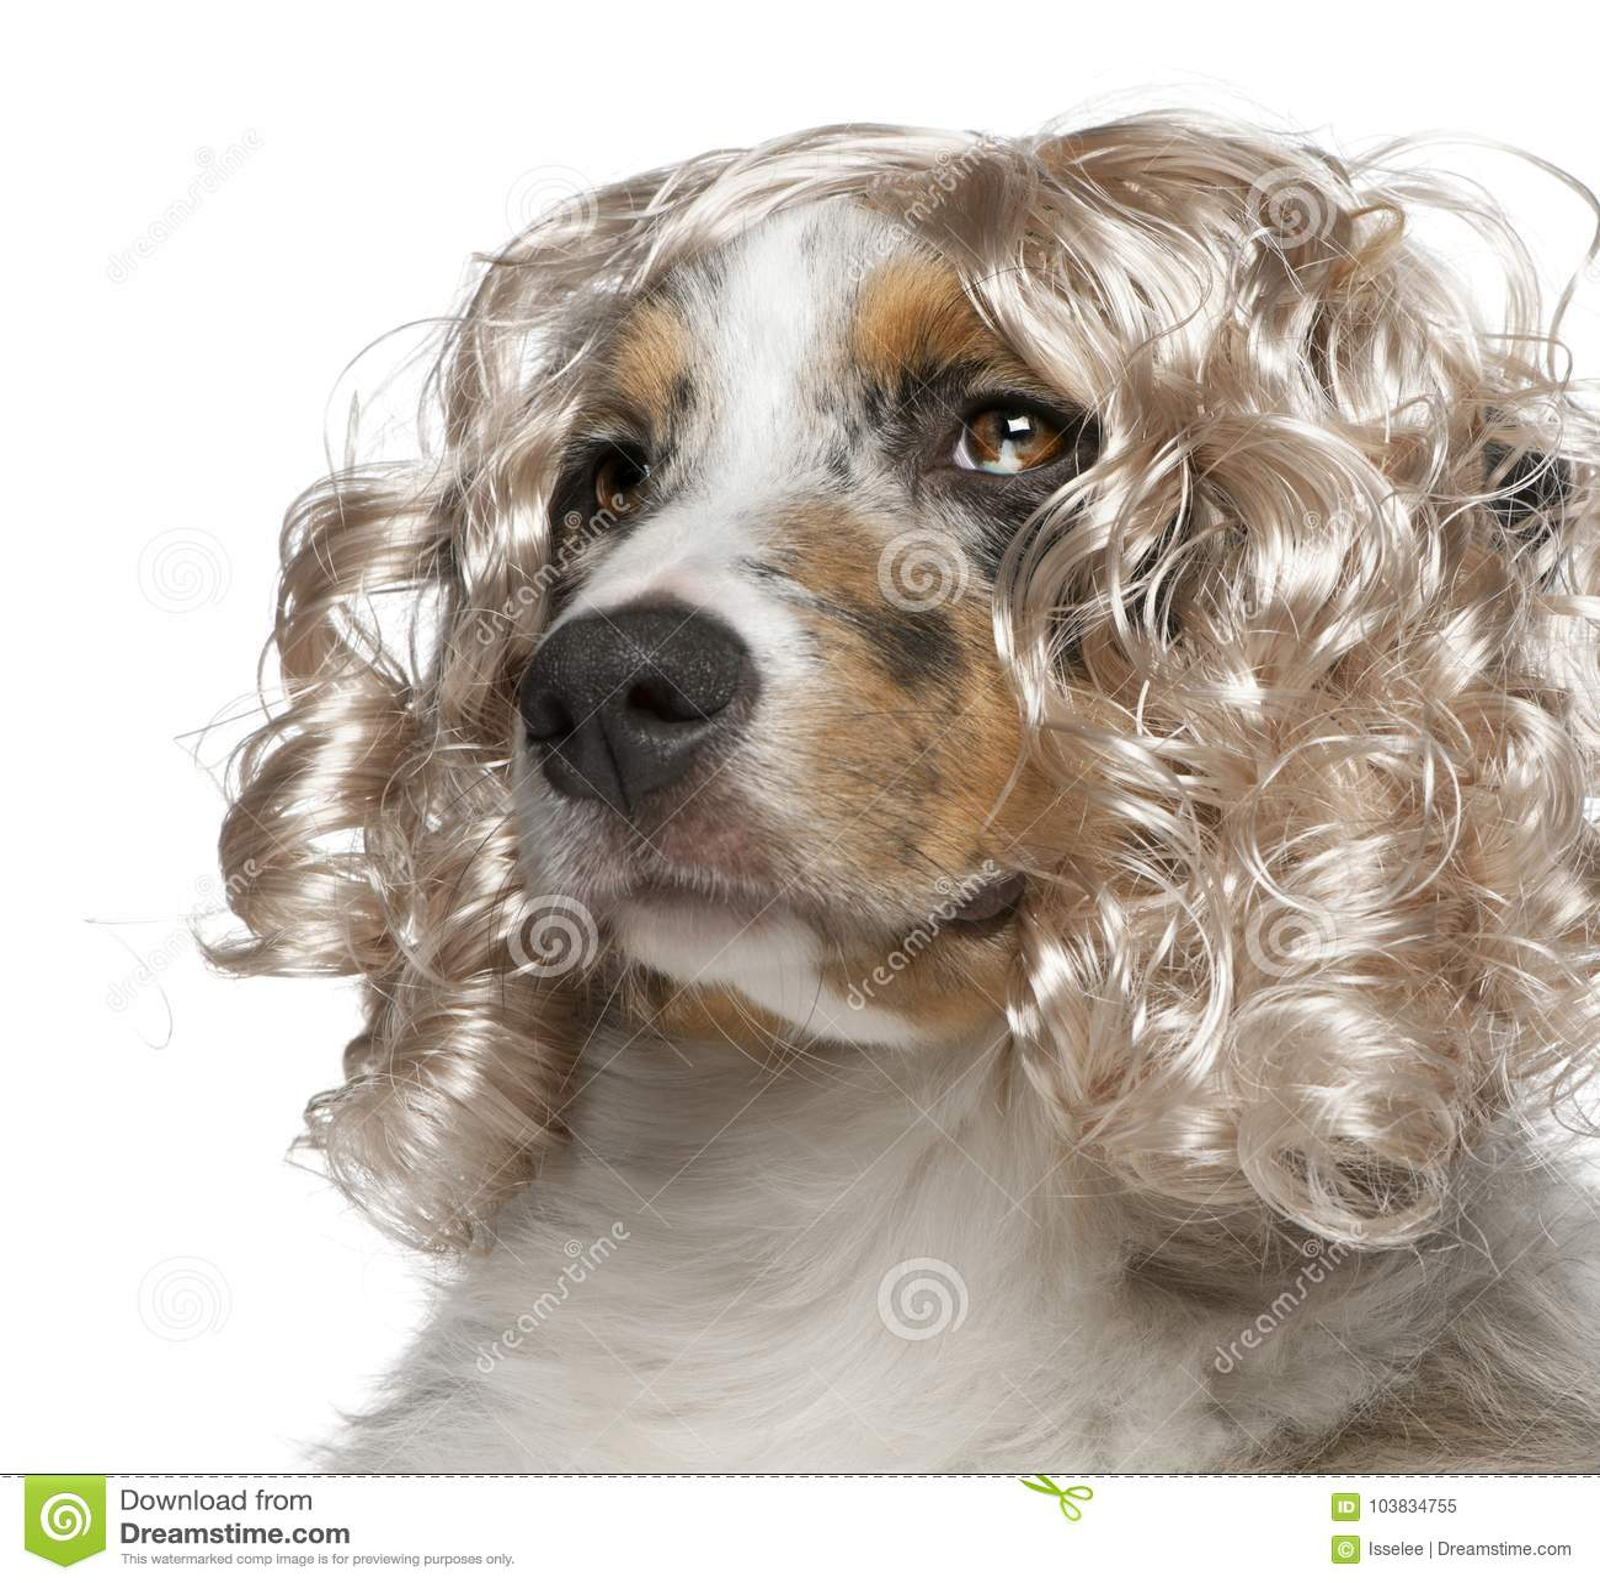 Close-up of Australian Shepherd puppy wearing a wig